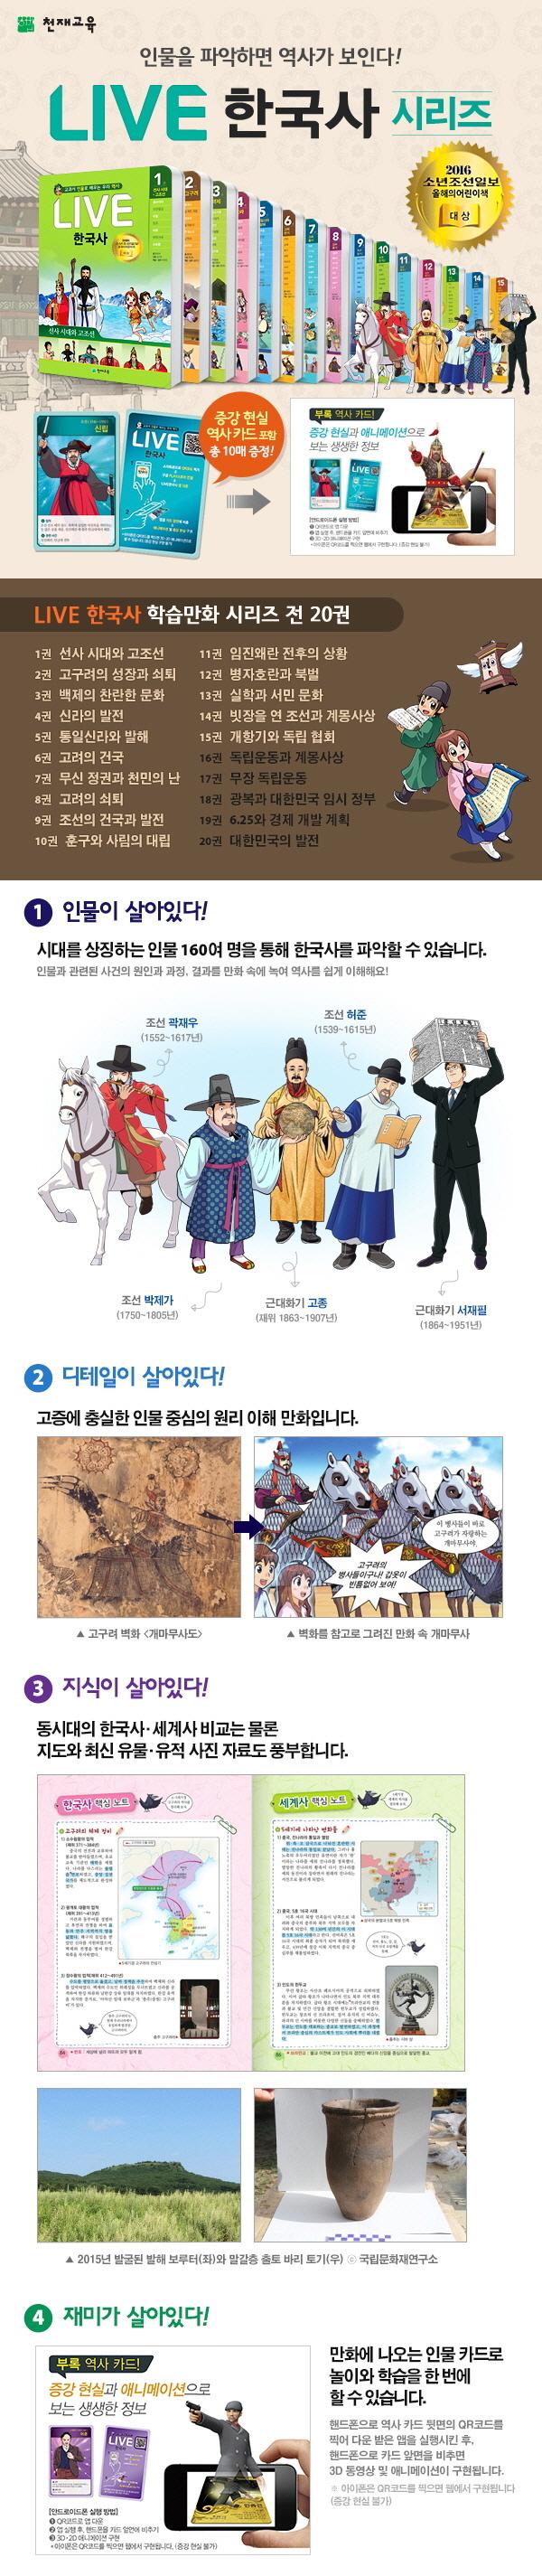 Live 한국사. 11: 임진왜란 전후의 상황(양장본 HardCover) 도서 상세이미지